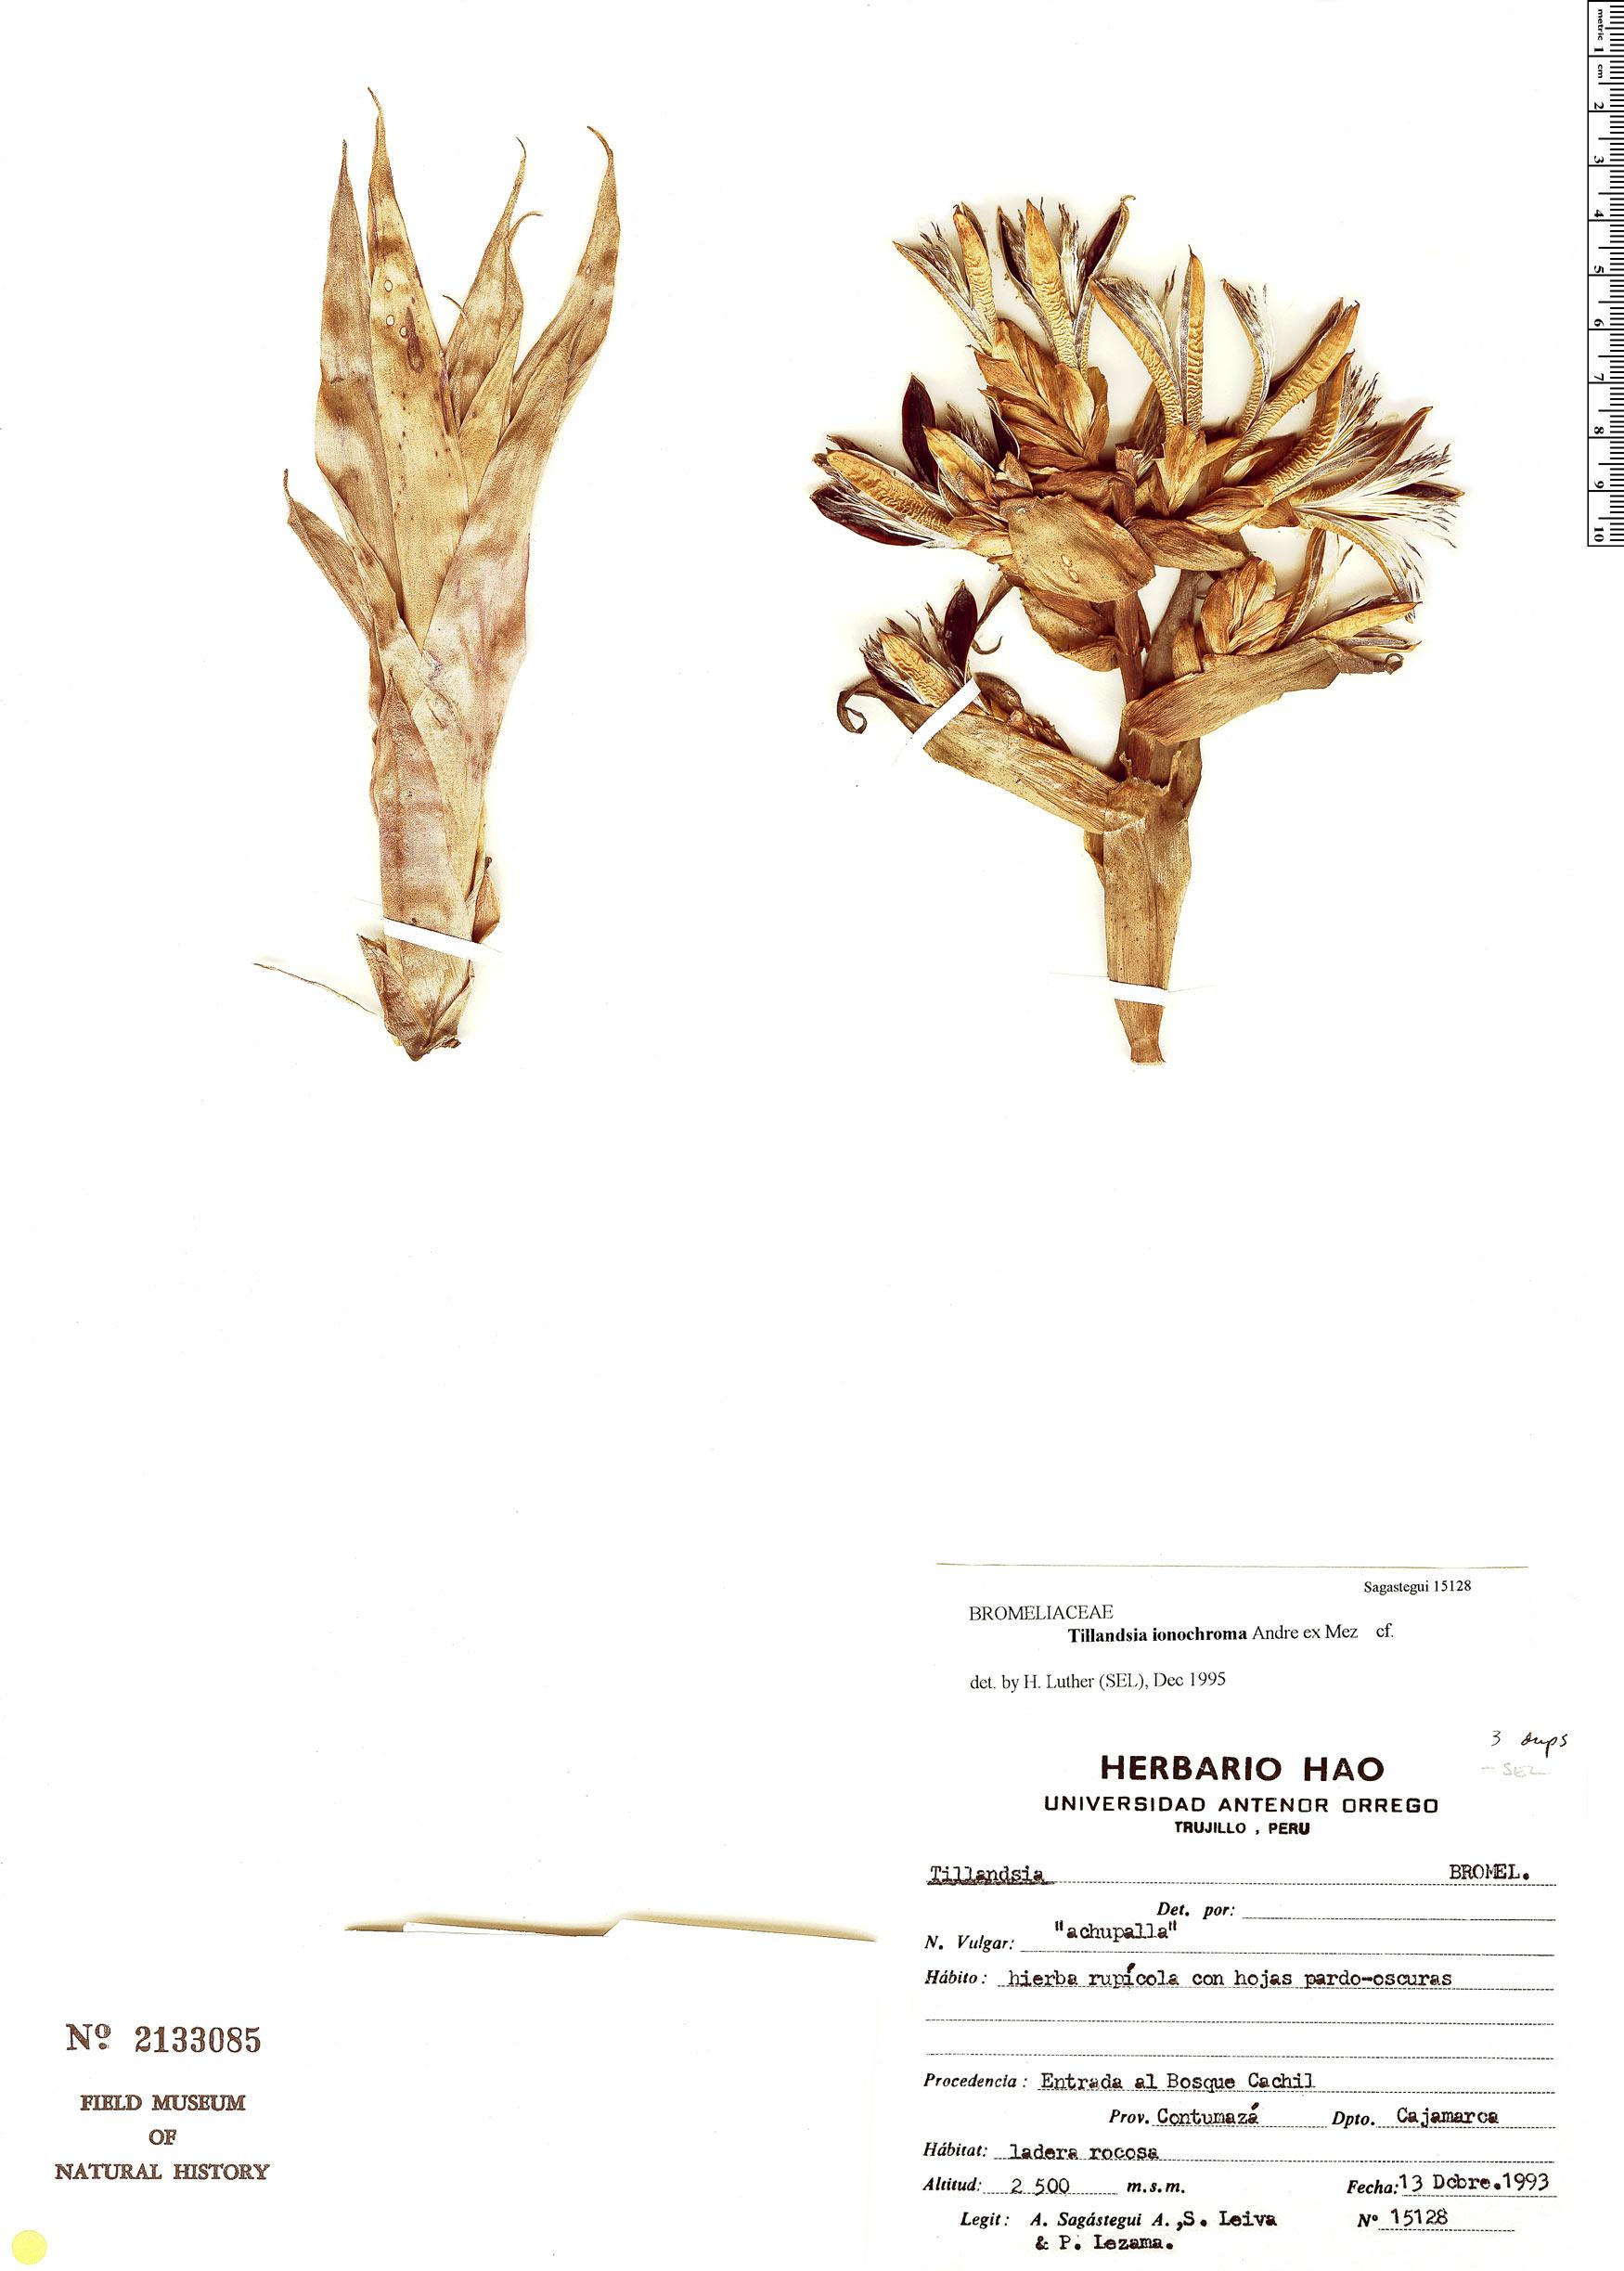 Specimen: Tillandsia ionochroma